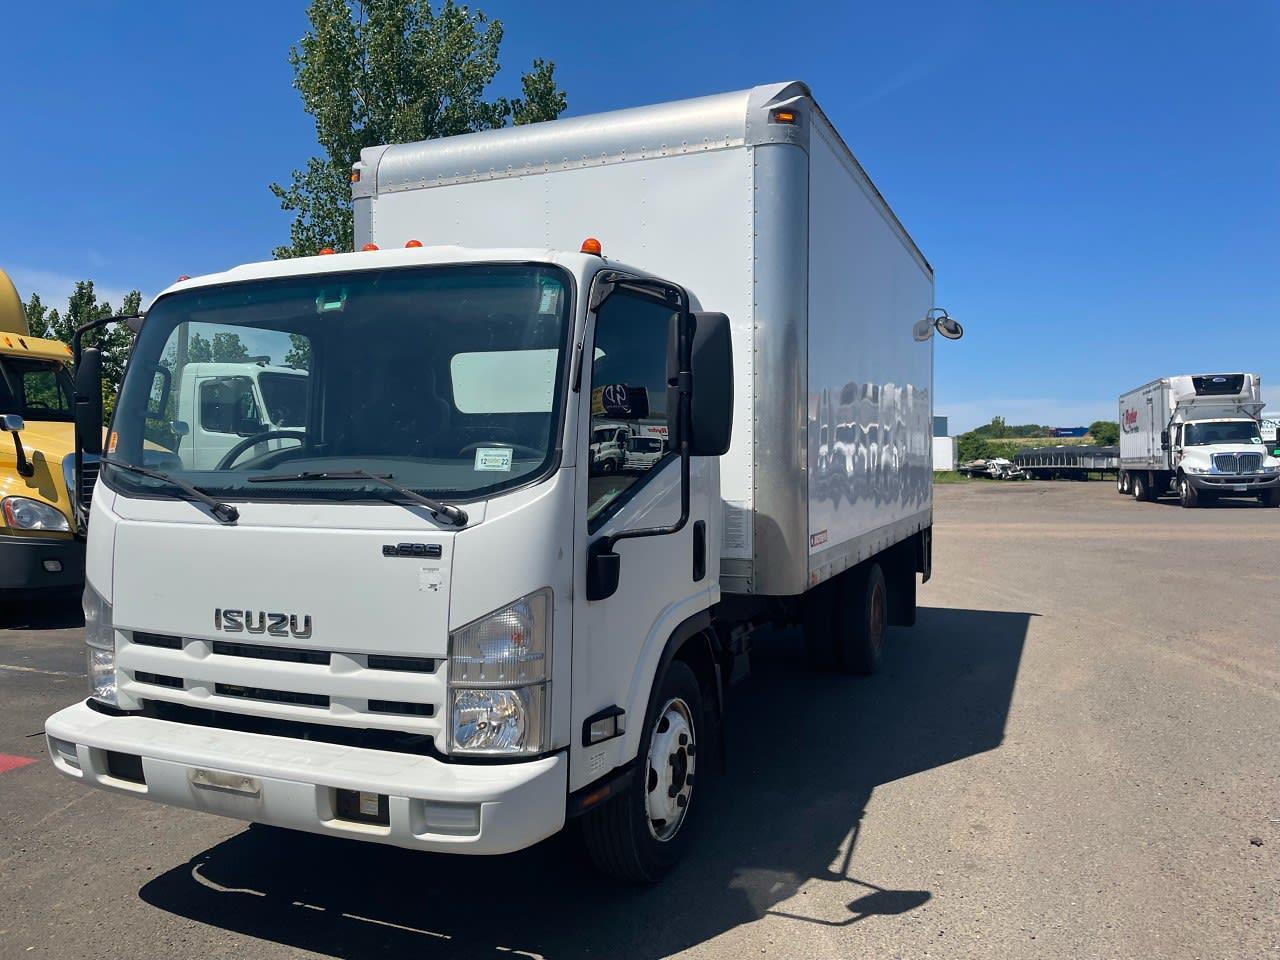 2014 Isuzu NPR-HD Regular Cab 4x2, Dry Freight #571154 - photo 1